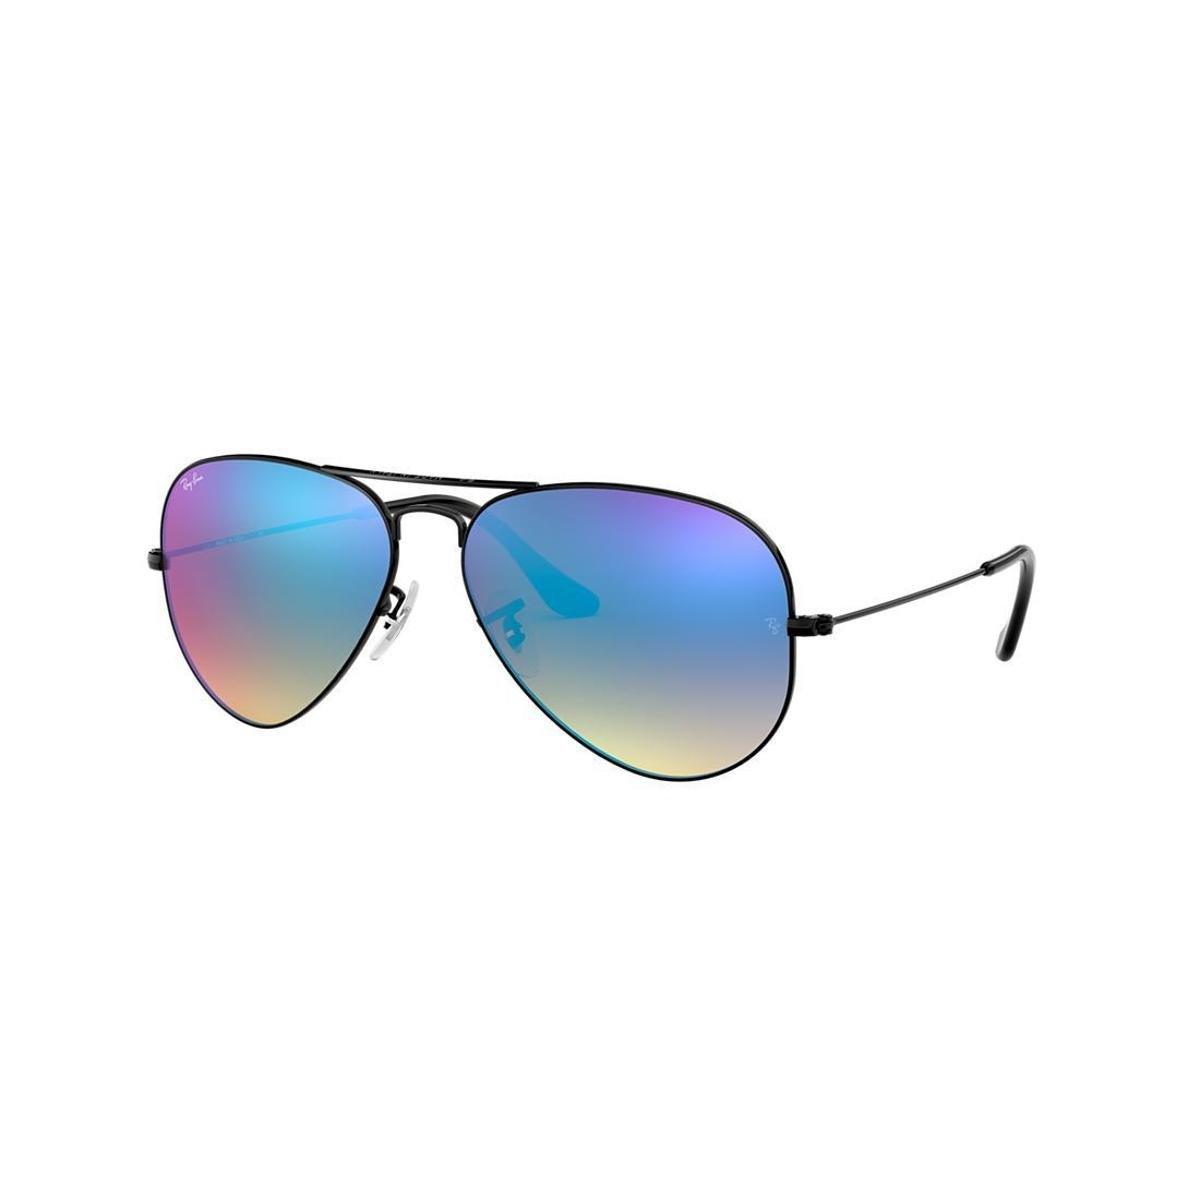 cd103be5a Óculos de Sol Ray-Ban RB3025L Aviator Gradiente Espelhado | Zattini